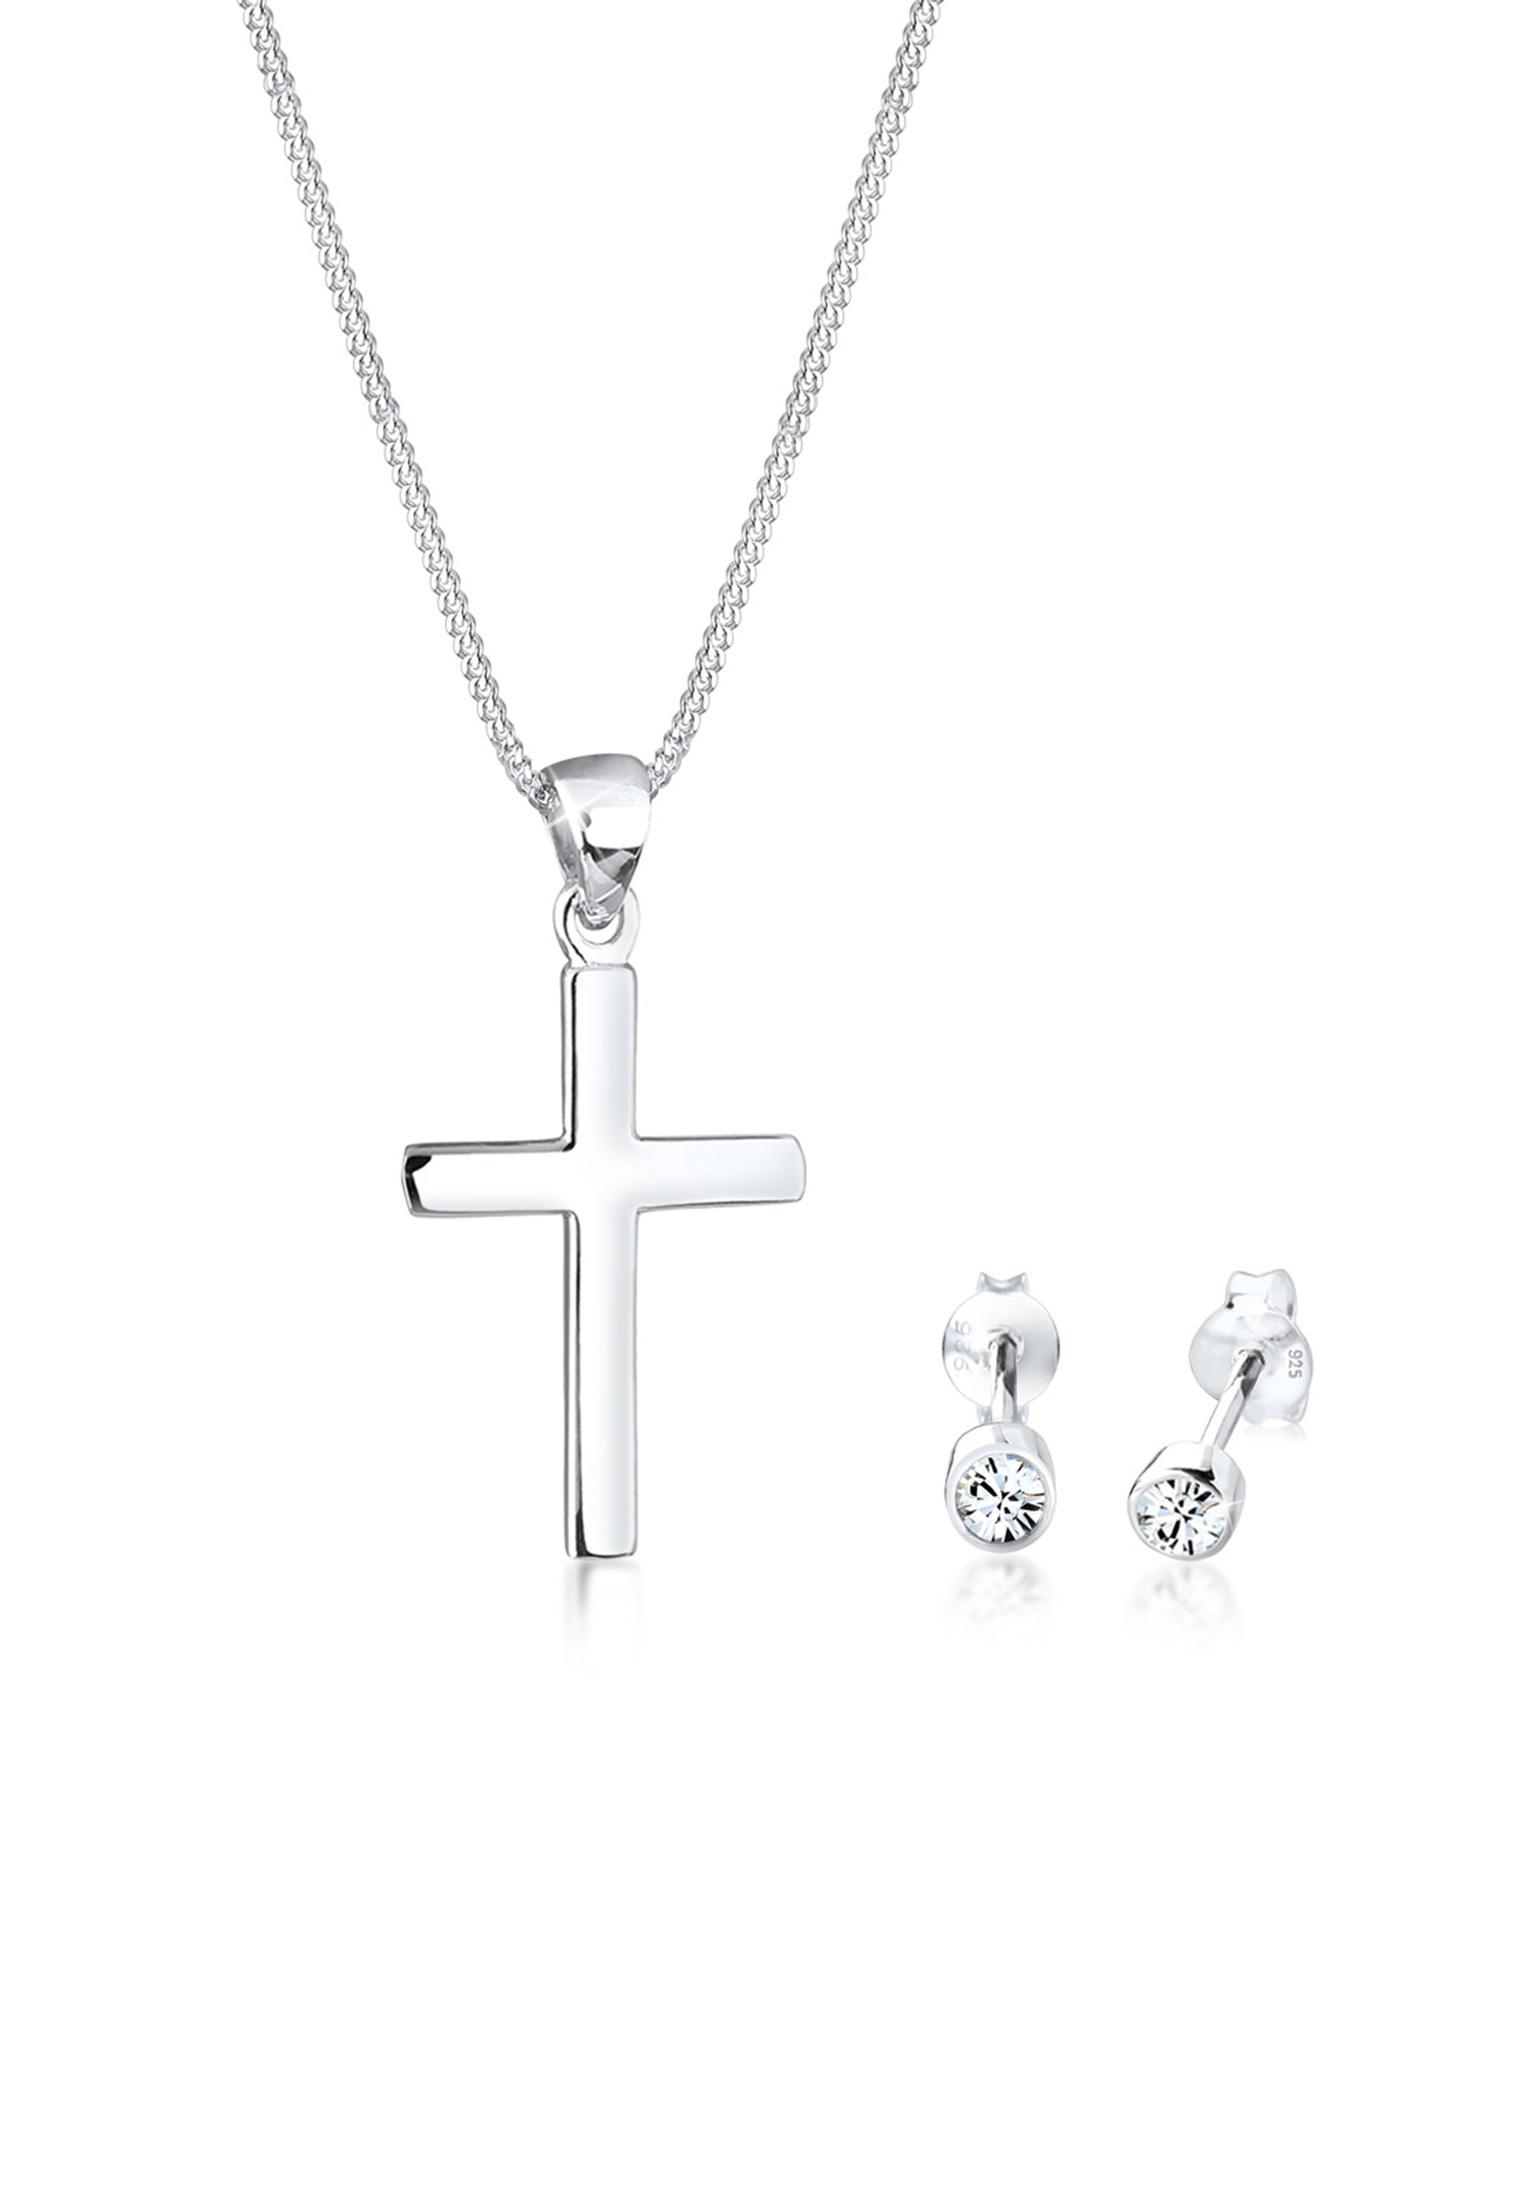 Schmuckset Kreuz | Kristall ( Weiß ) | 925er Sterling Silber